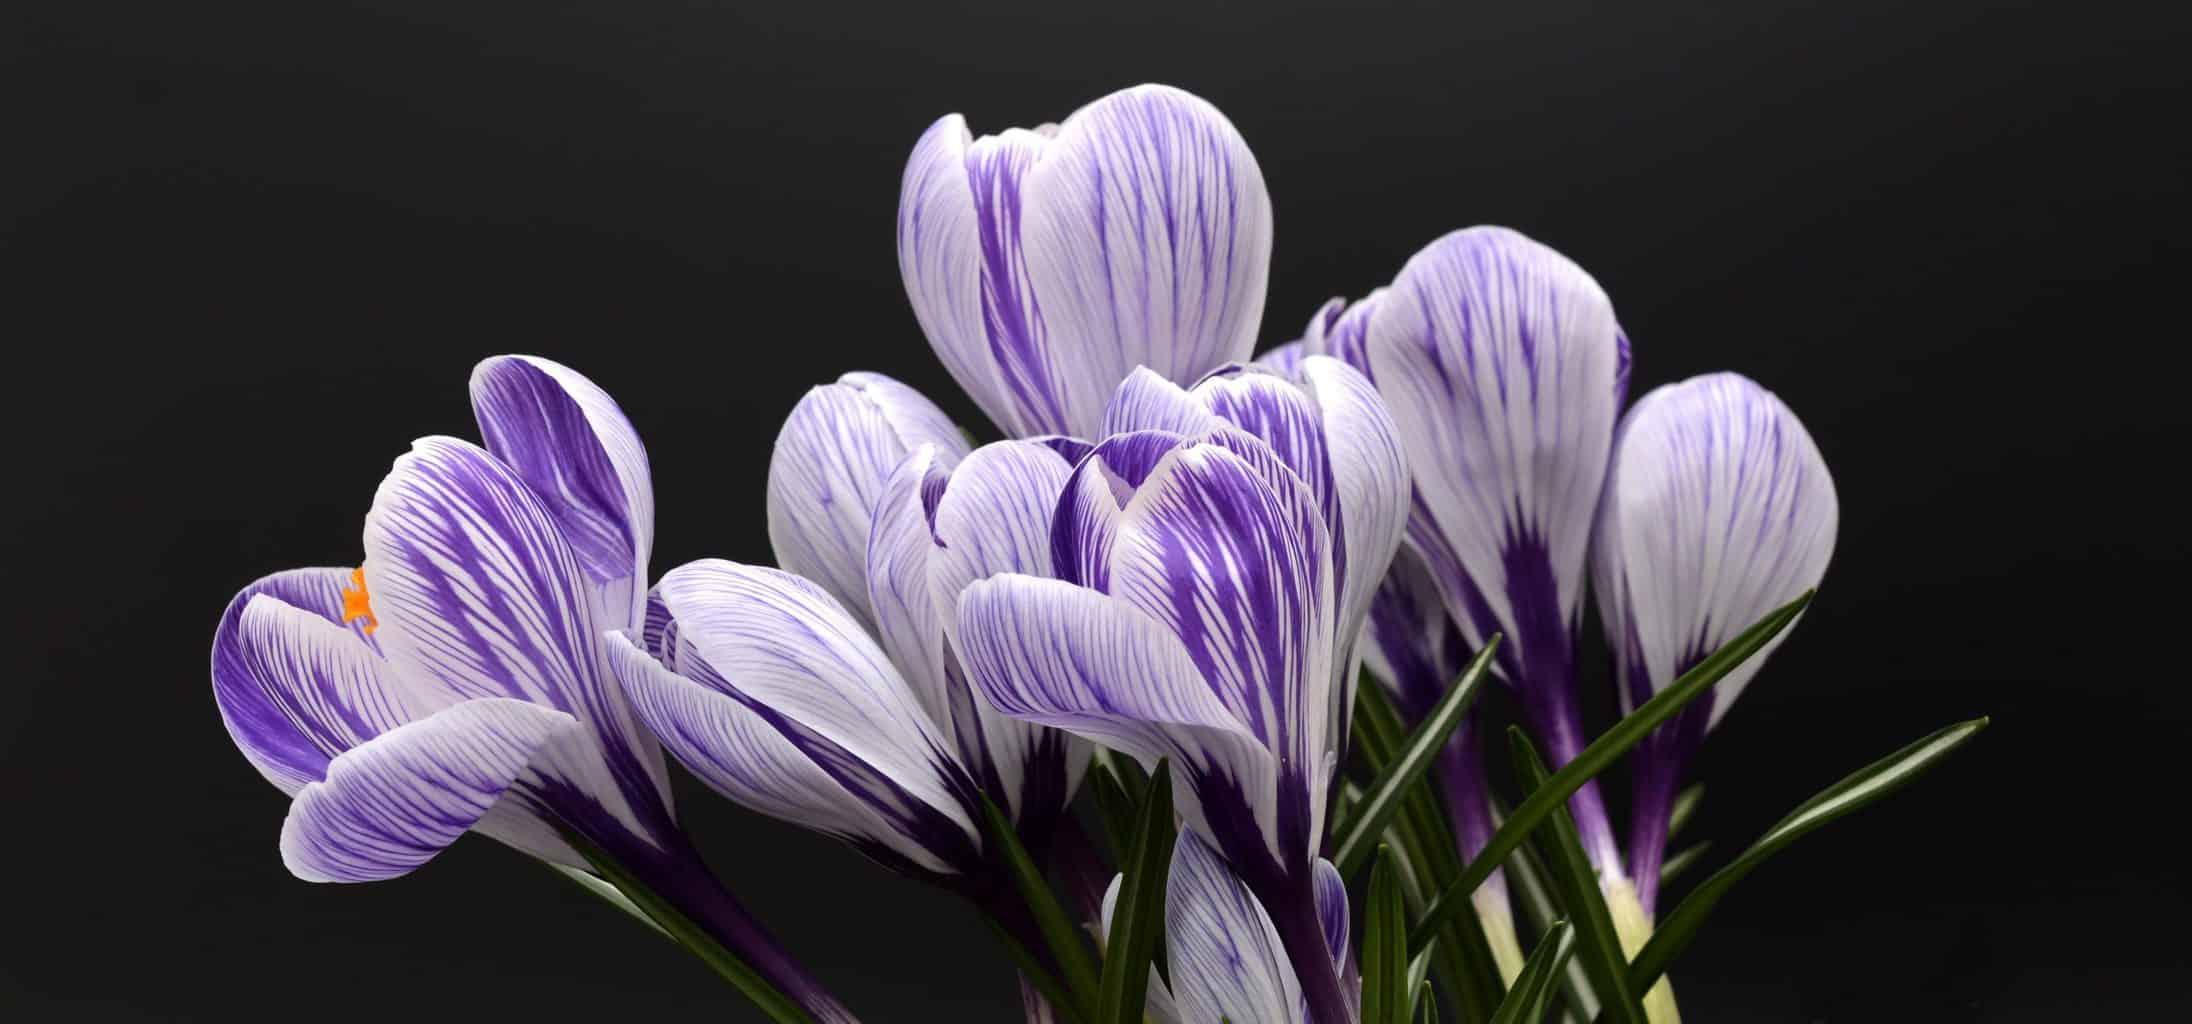 crocus, flowers, purple flowers